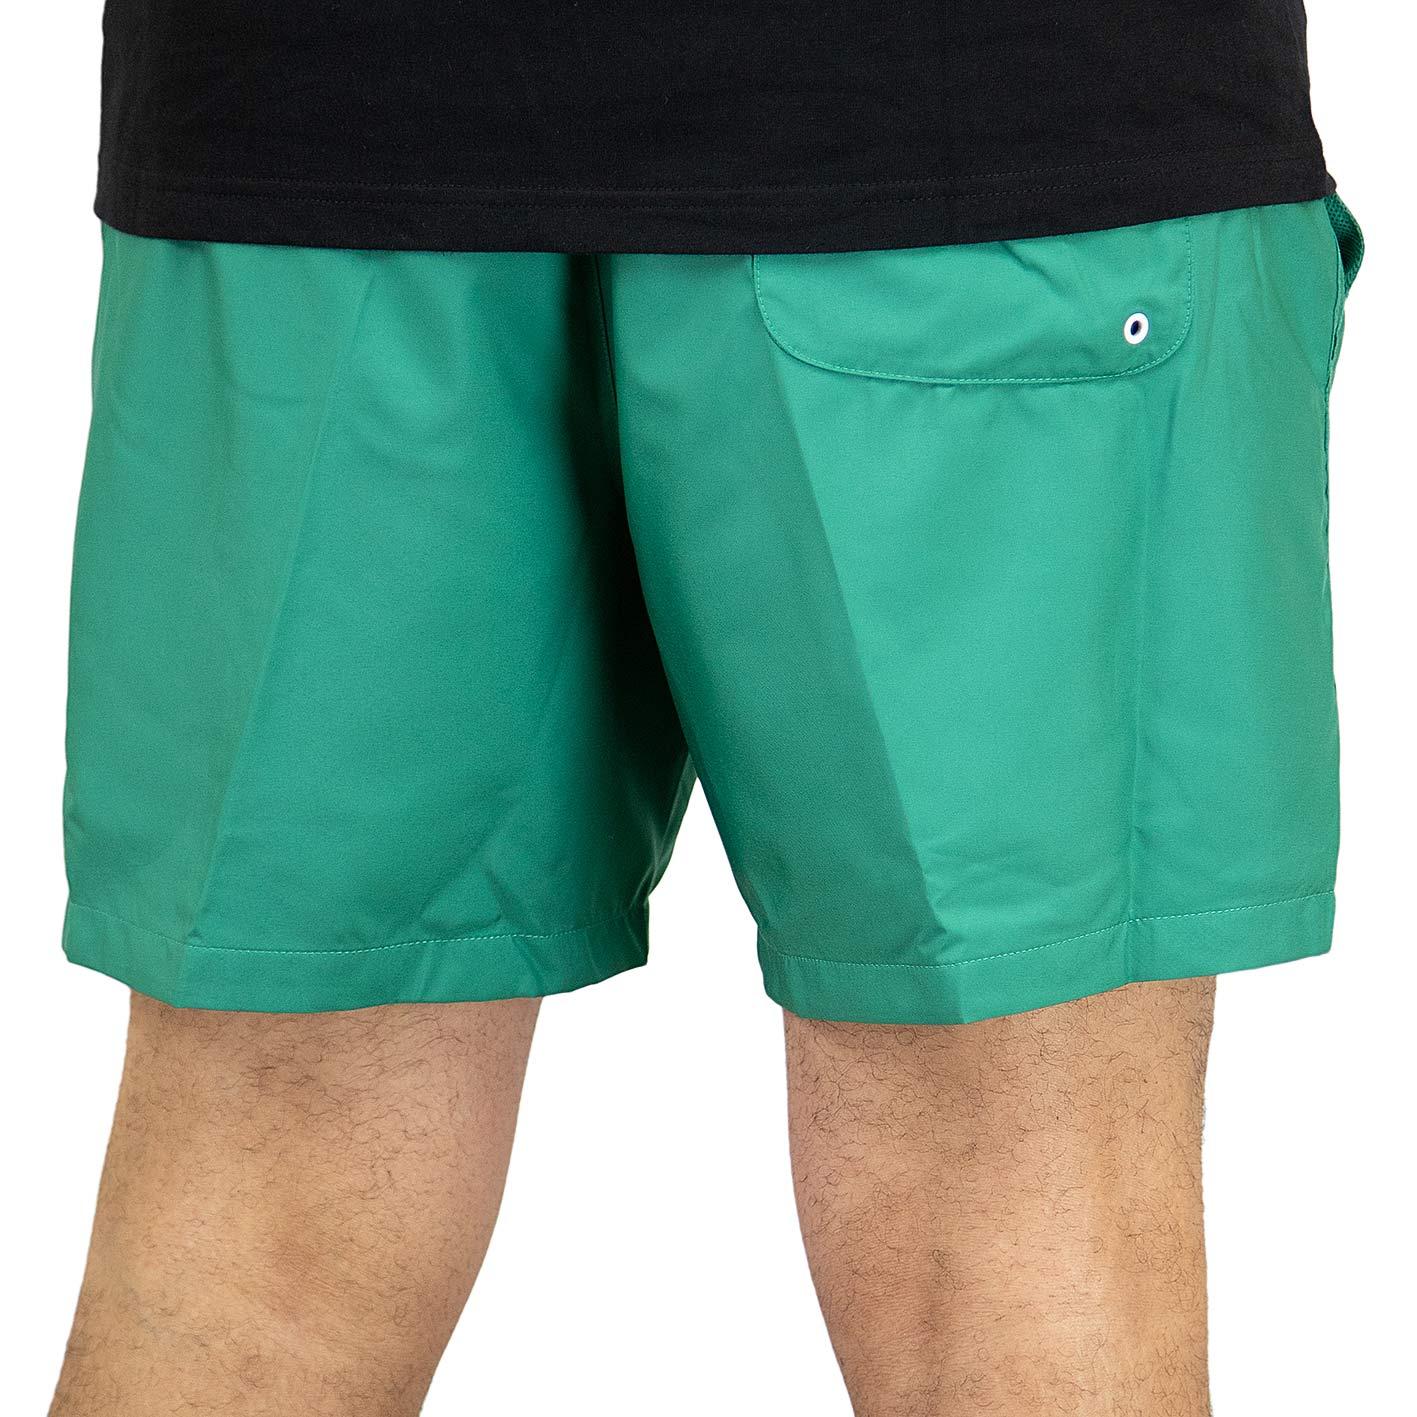 ☆ Nike Shorts Woven Flow grünweiß hier bestellen!